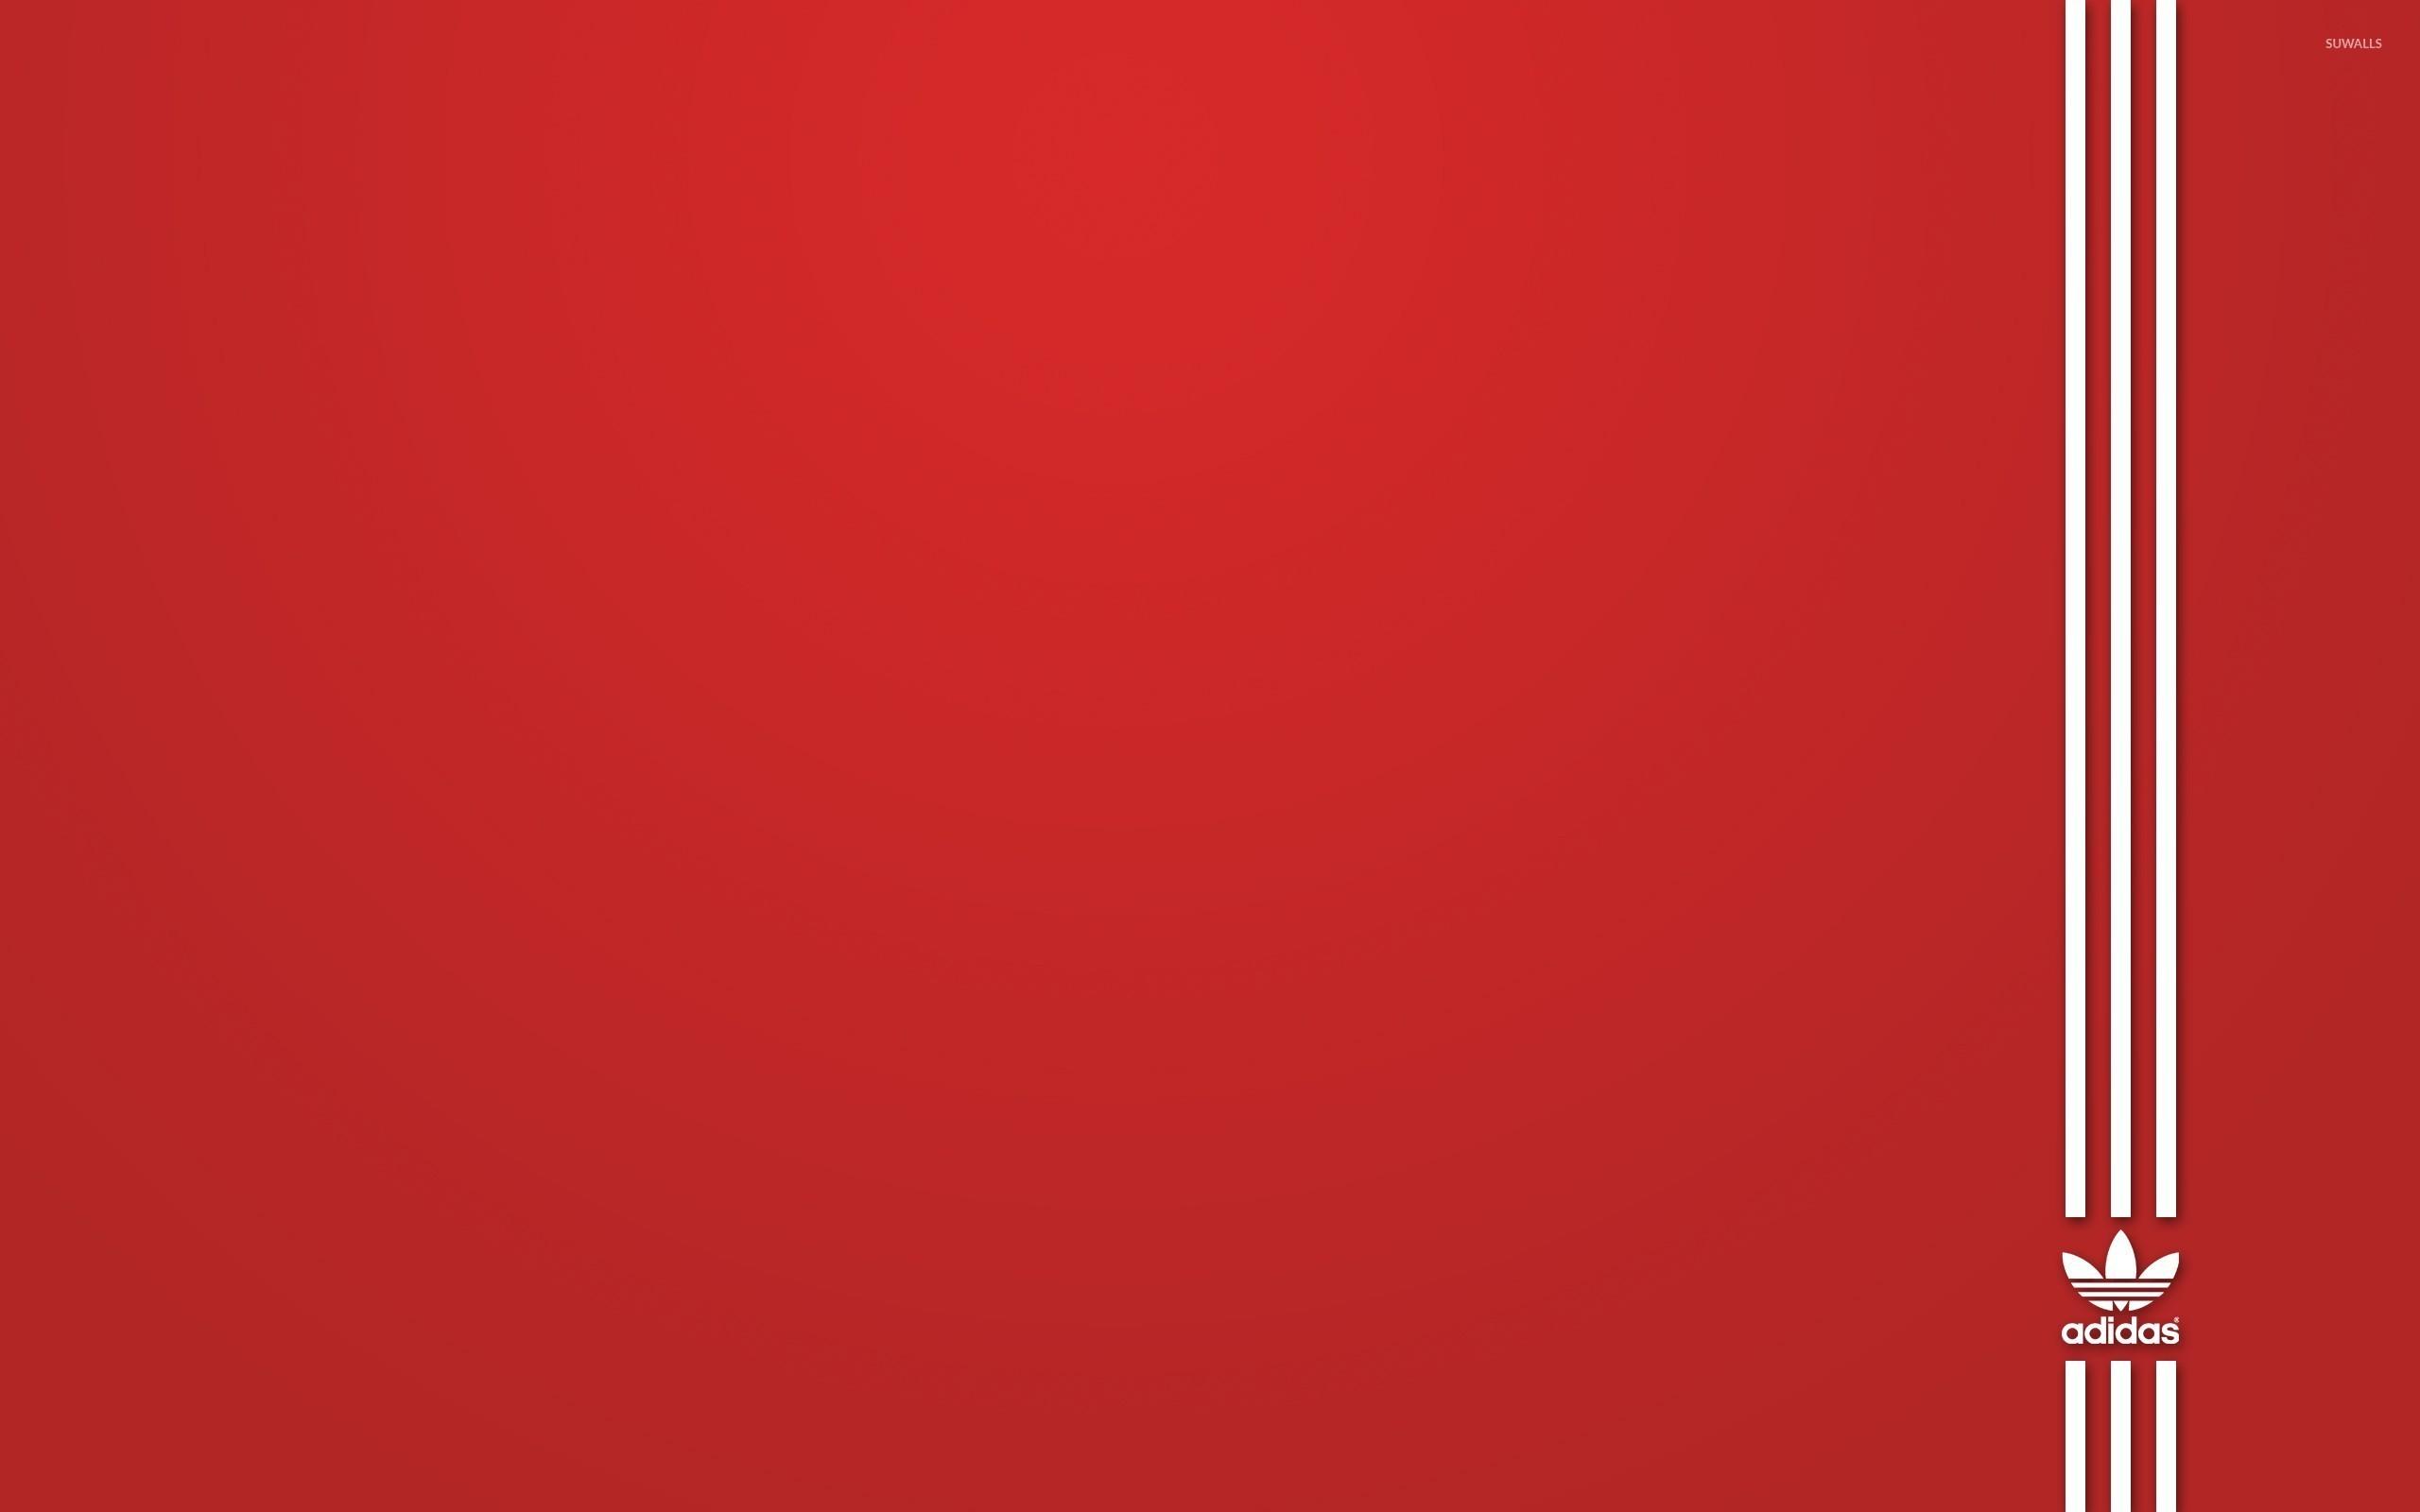 Adidas Wallpaper Mobile …